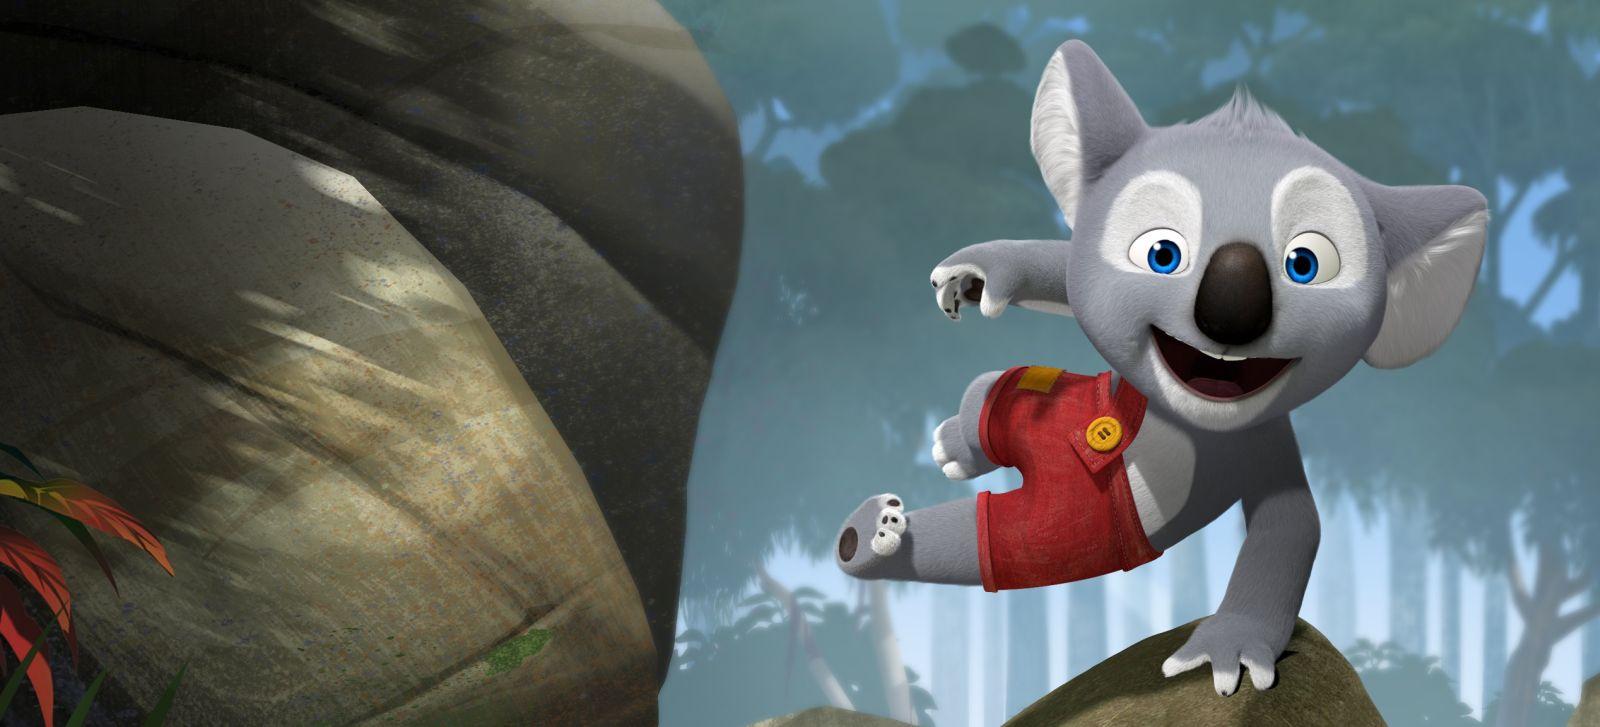 Billy il koala da cucciolo a eroe cameralook